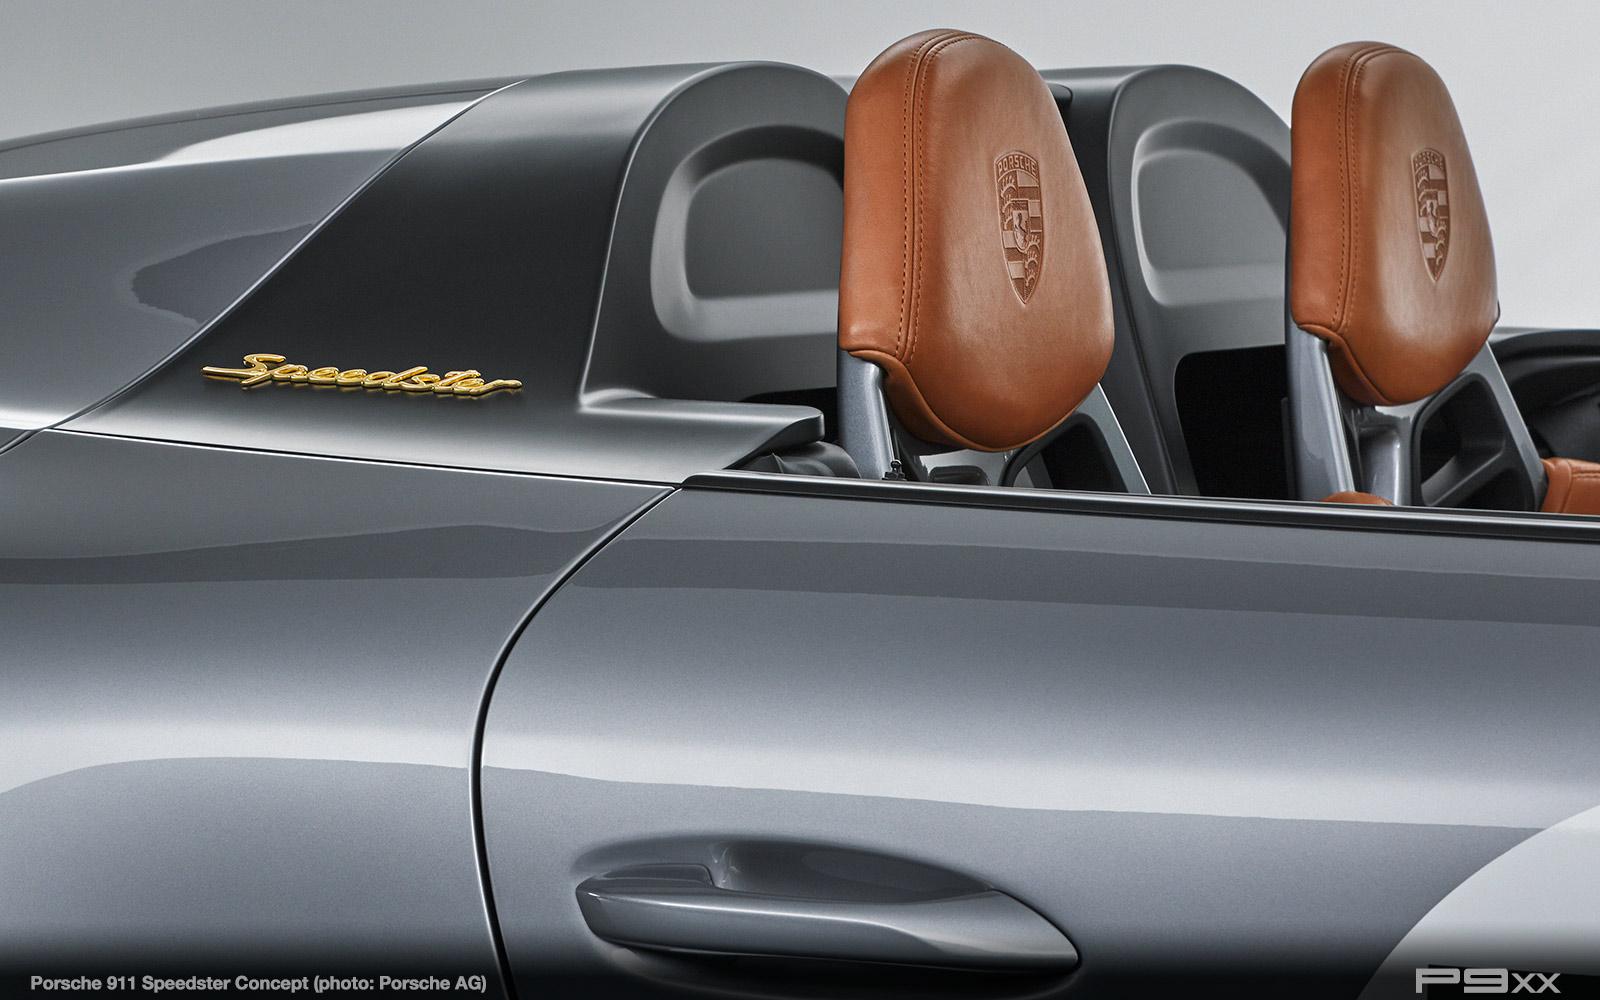 Porsche-911-Speedster-Concept-2018-307